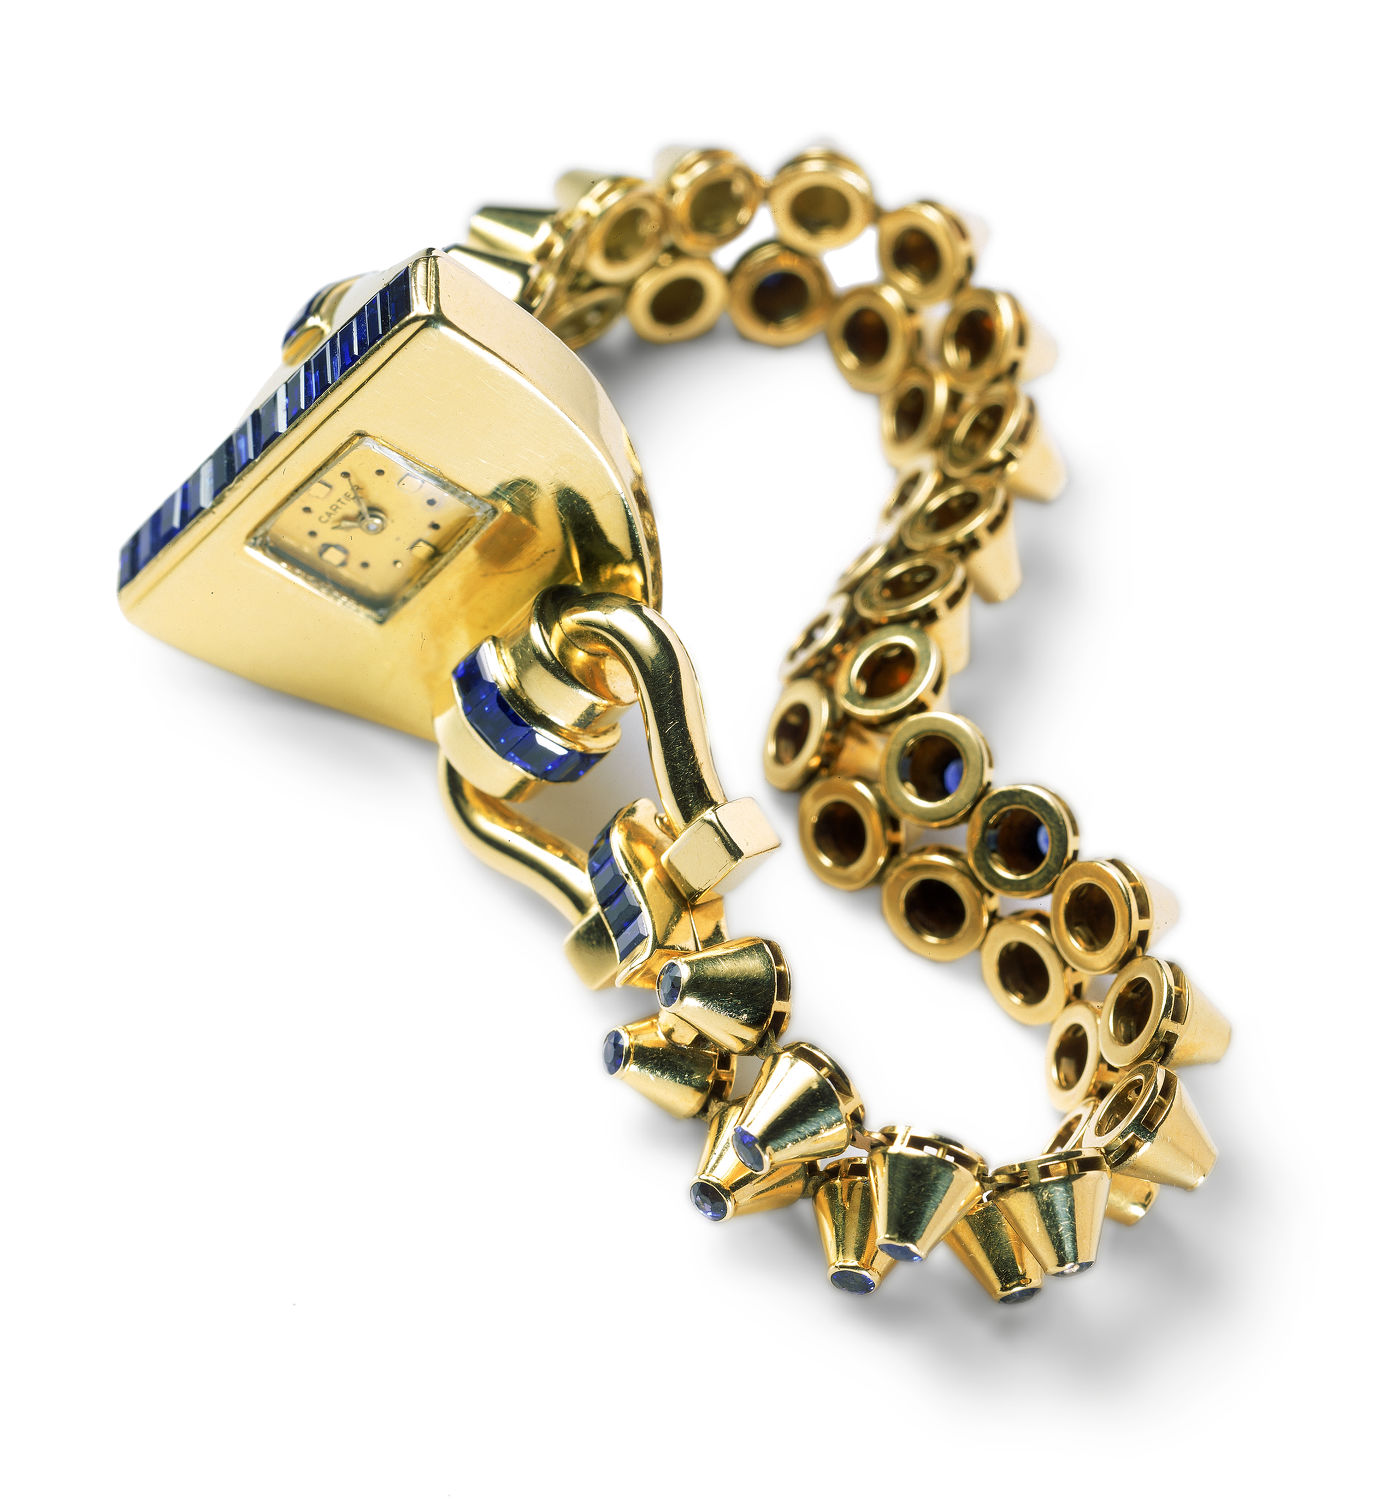 Cartier Collection Modernistic bracelet-watch - THE EDGE SINGAPORE